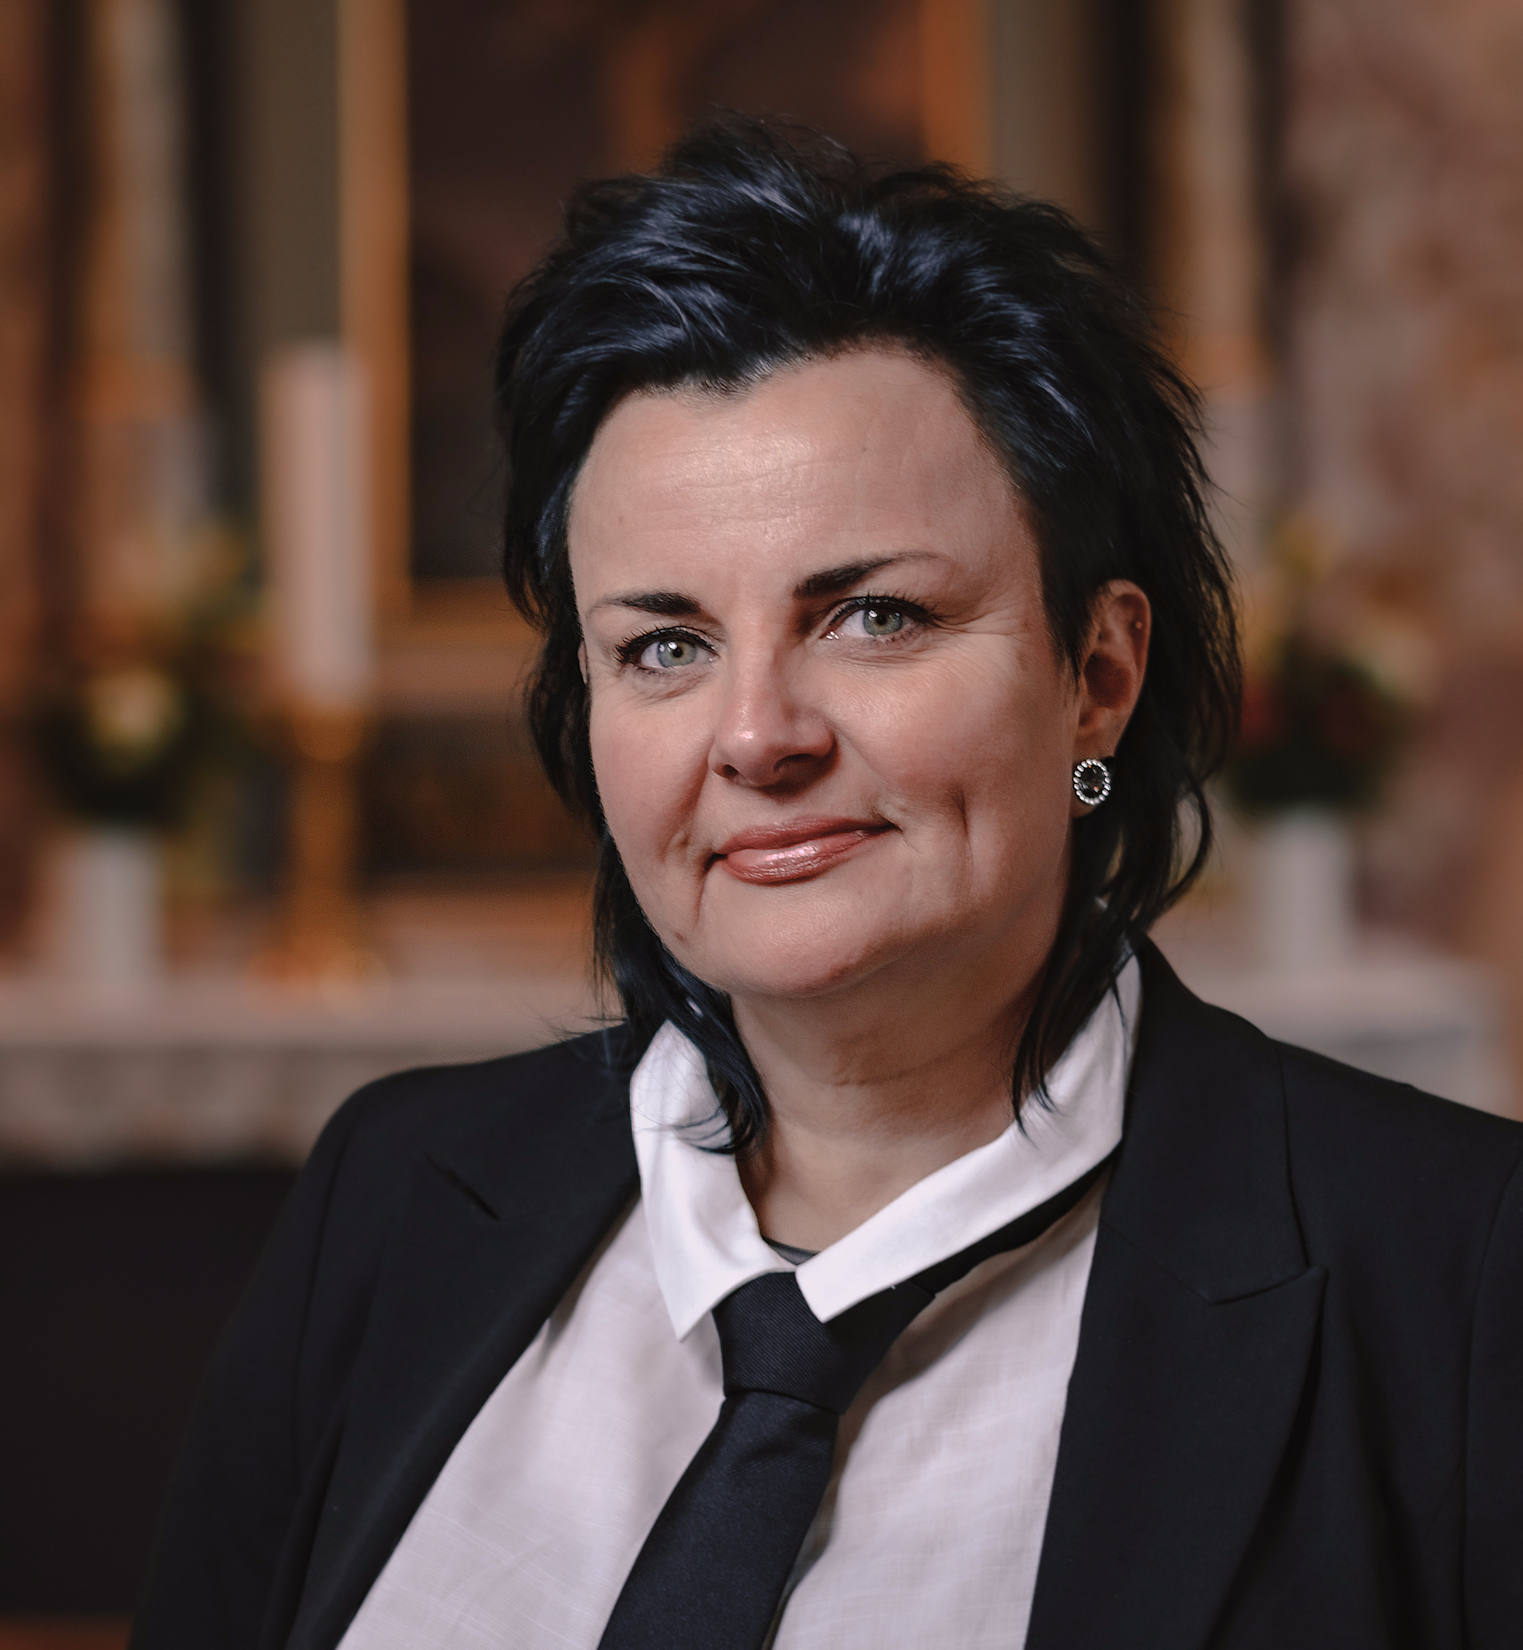 Bededame Sanne Egebjerg